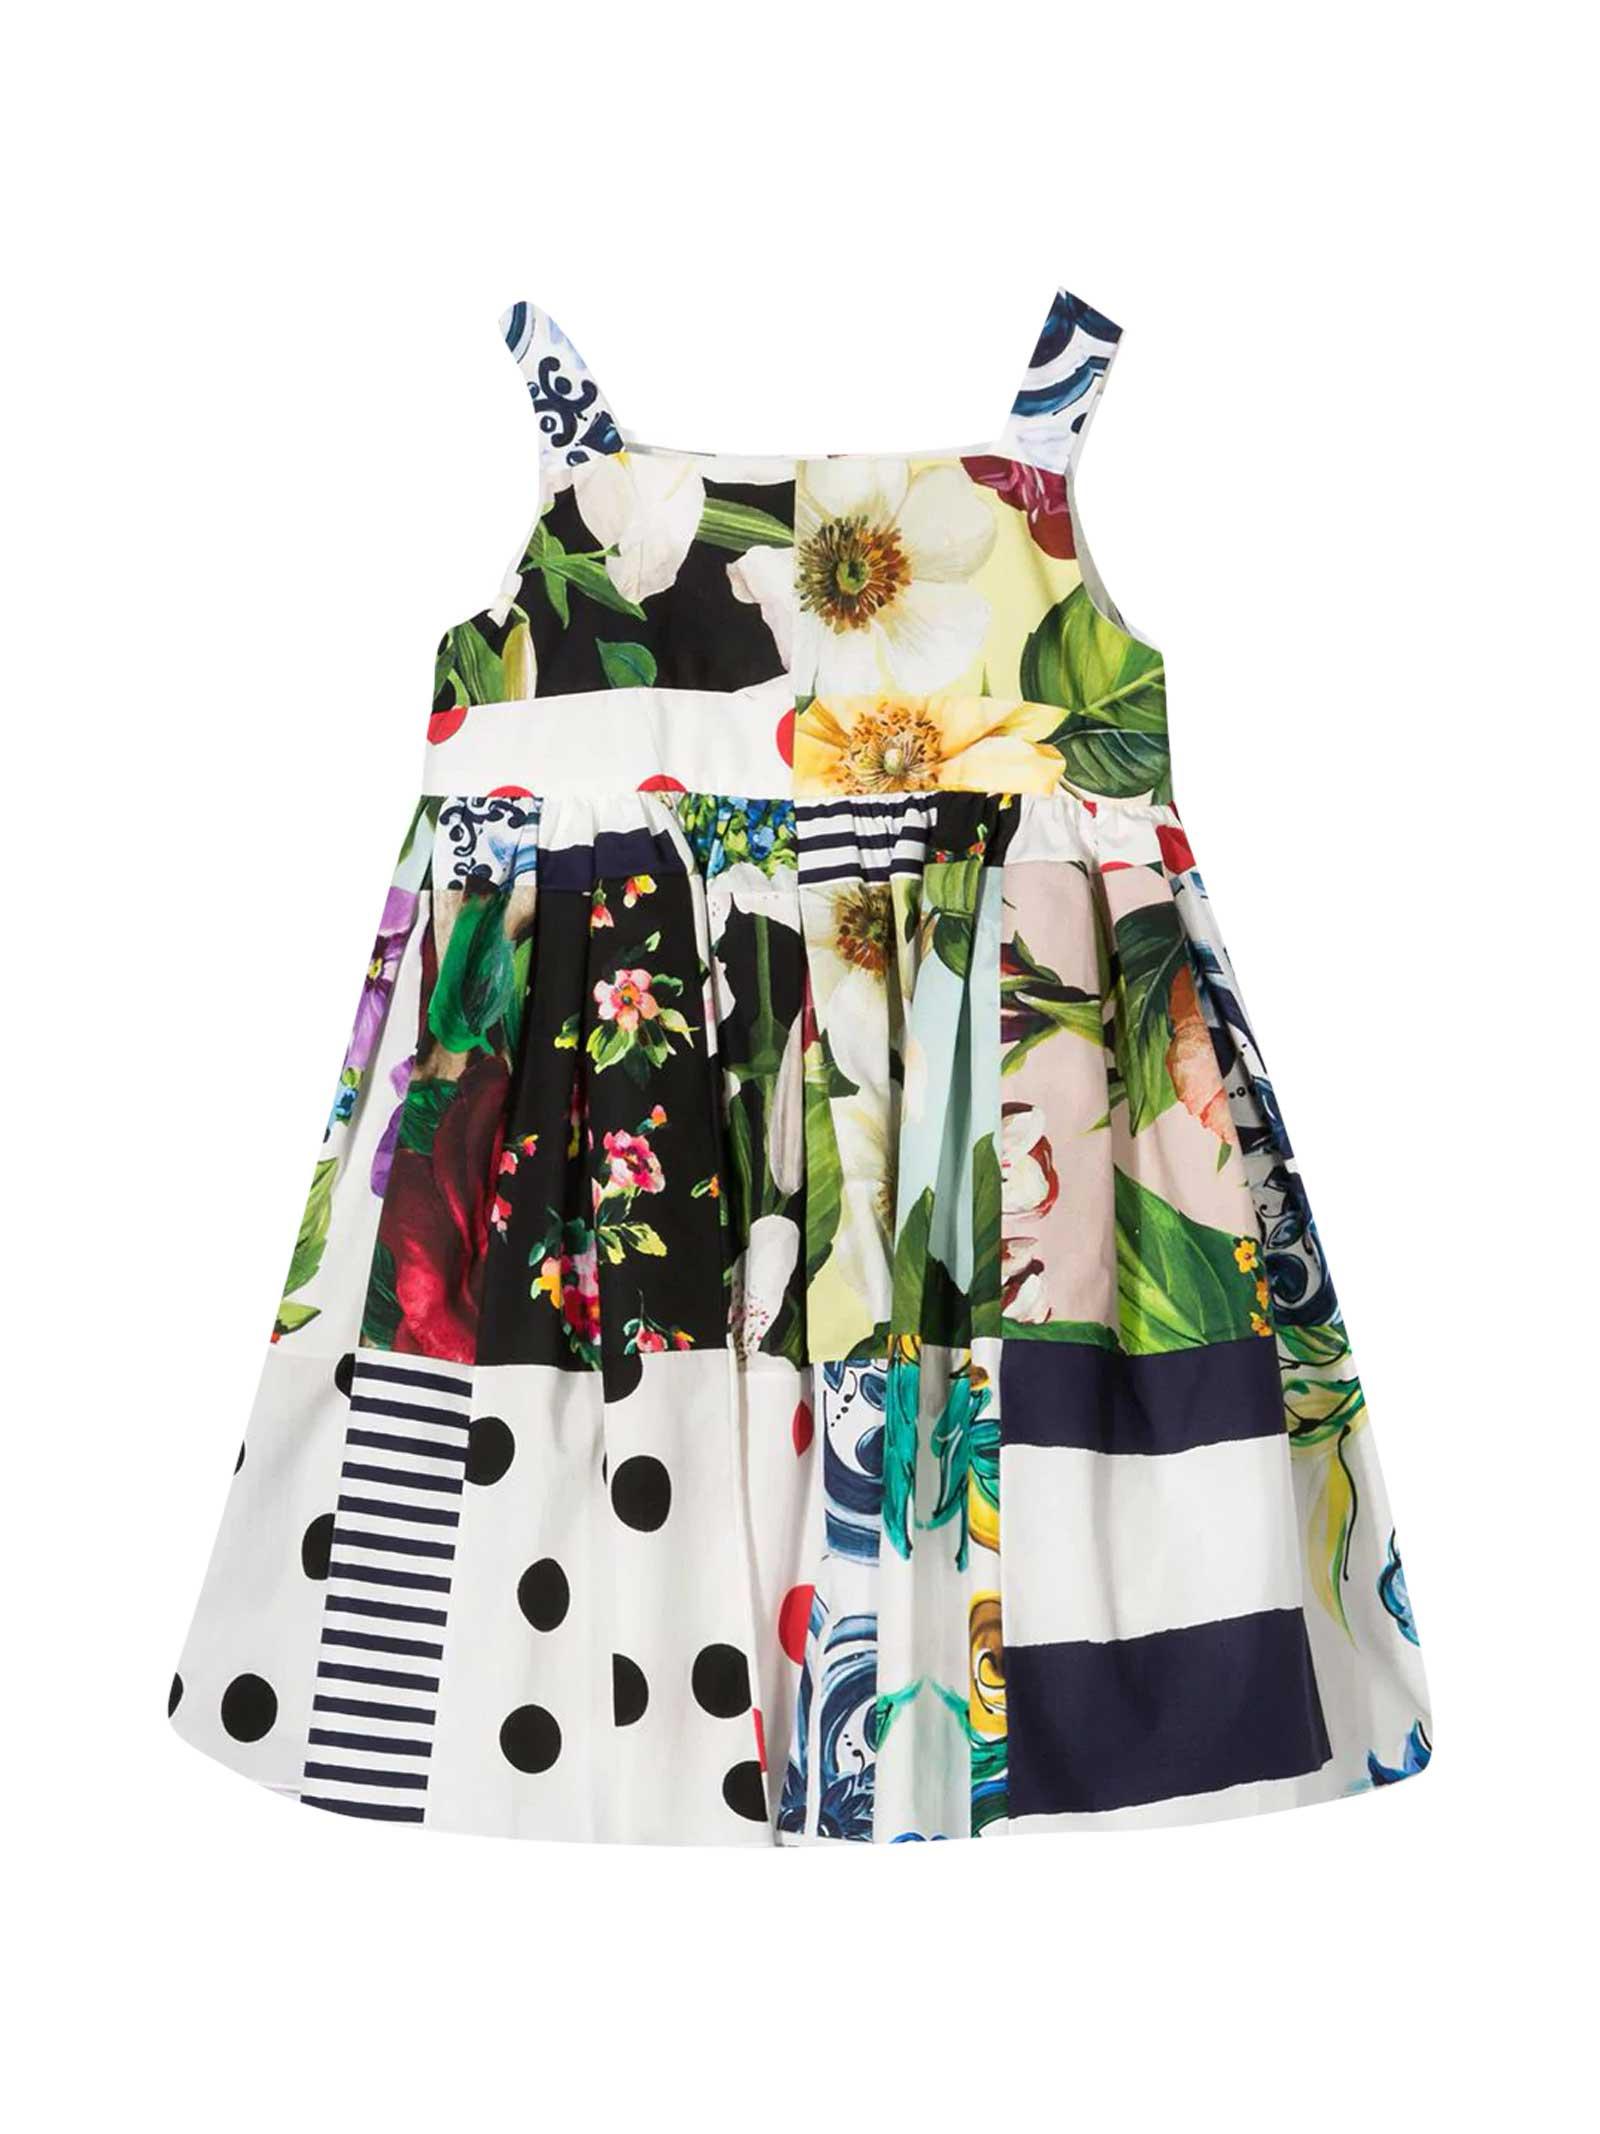 Dolce & Gabbana Dresses PATTERNED DRESS